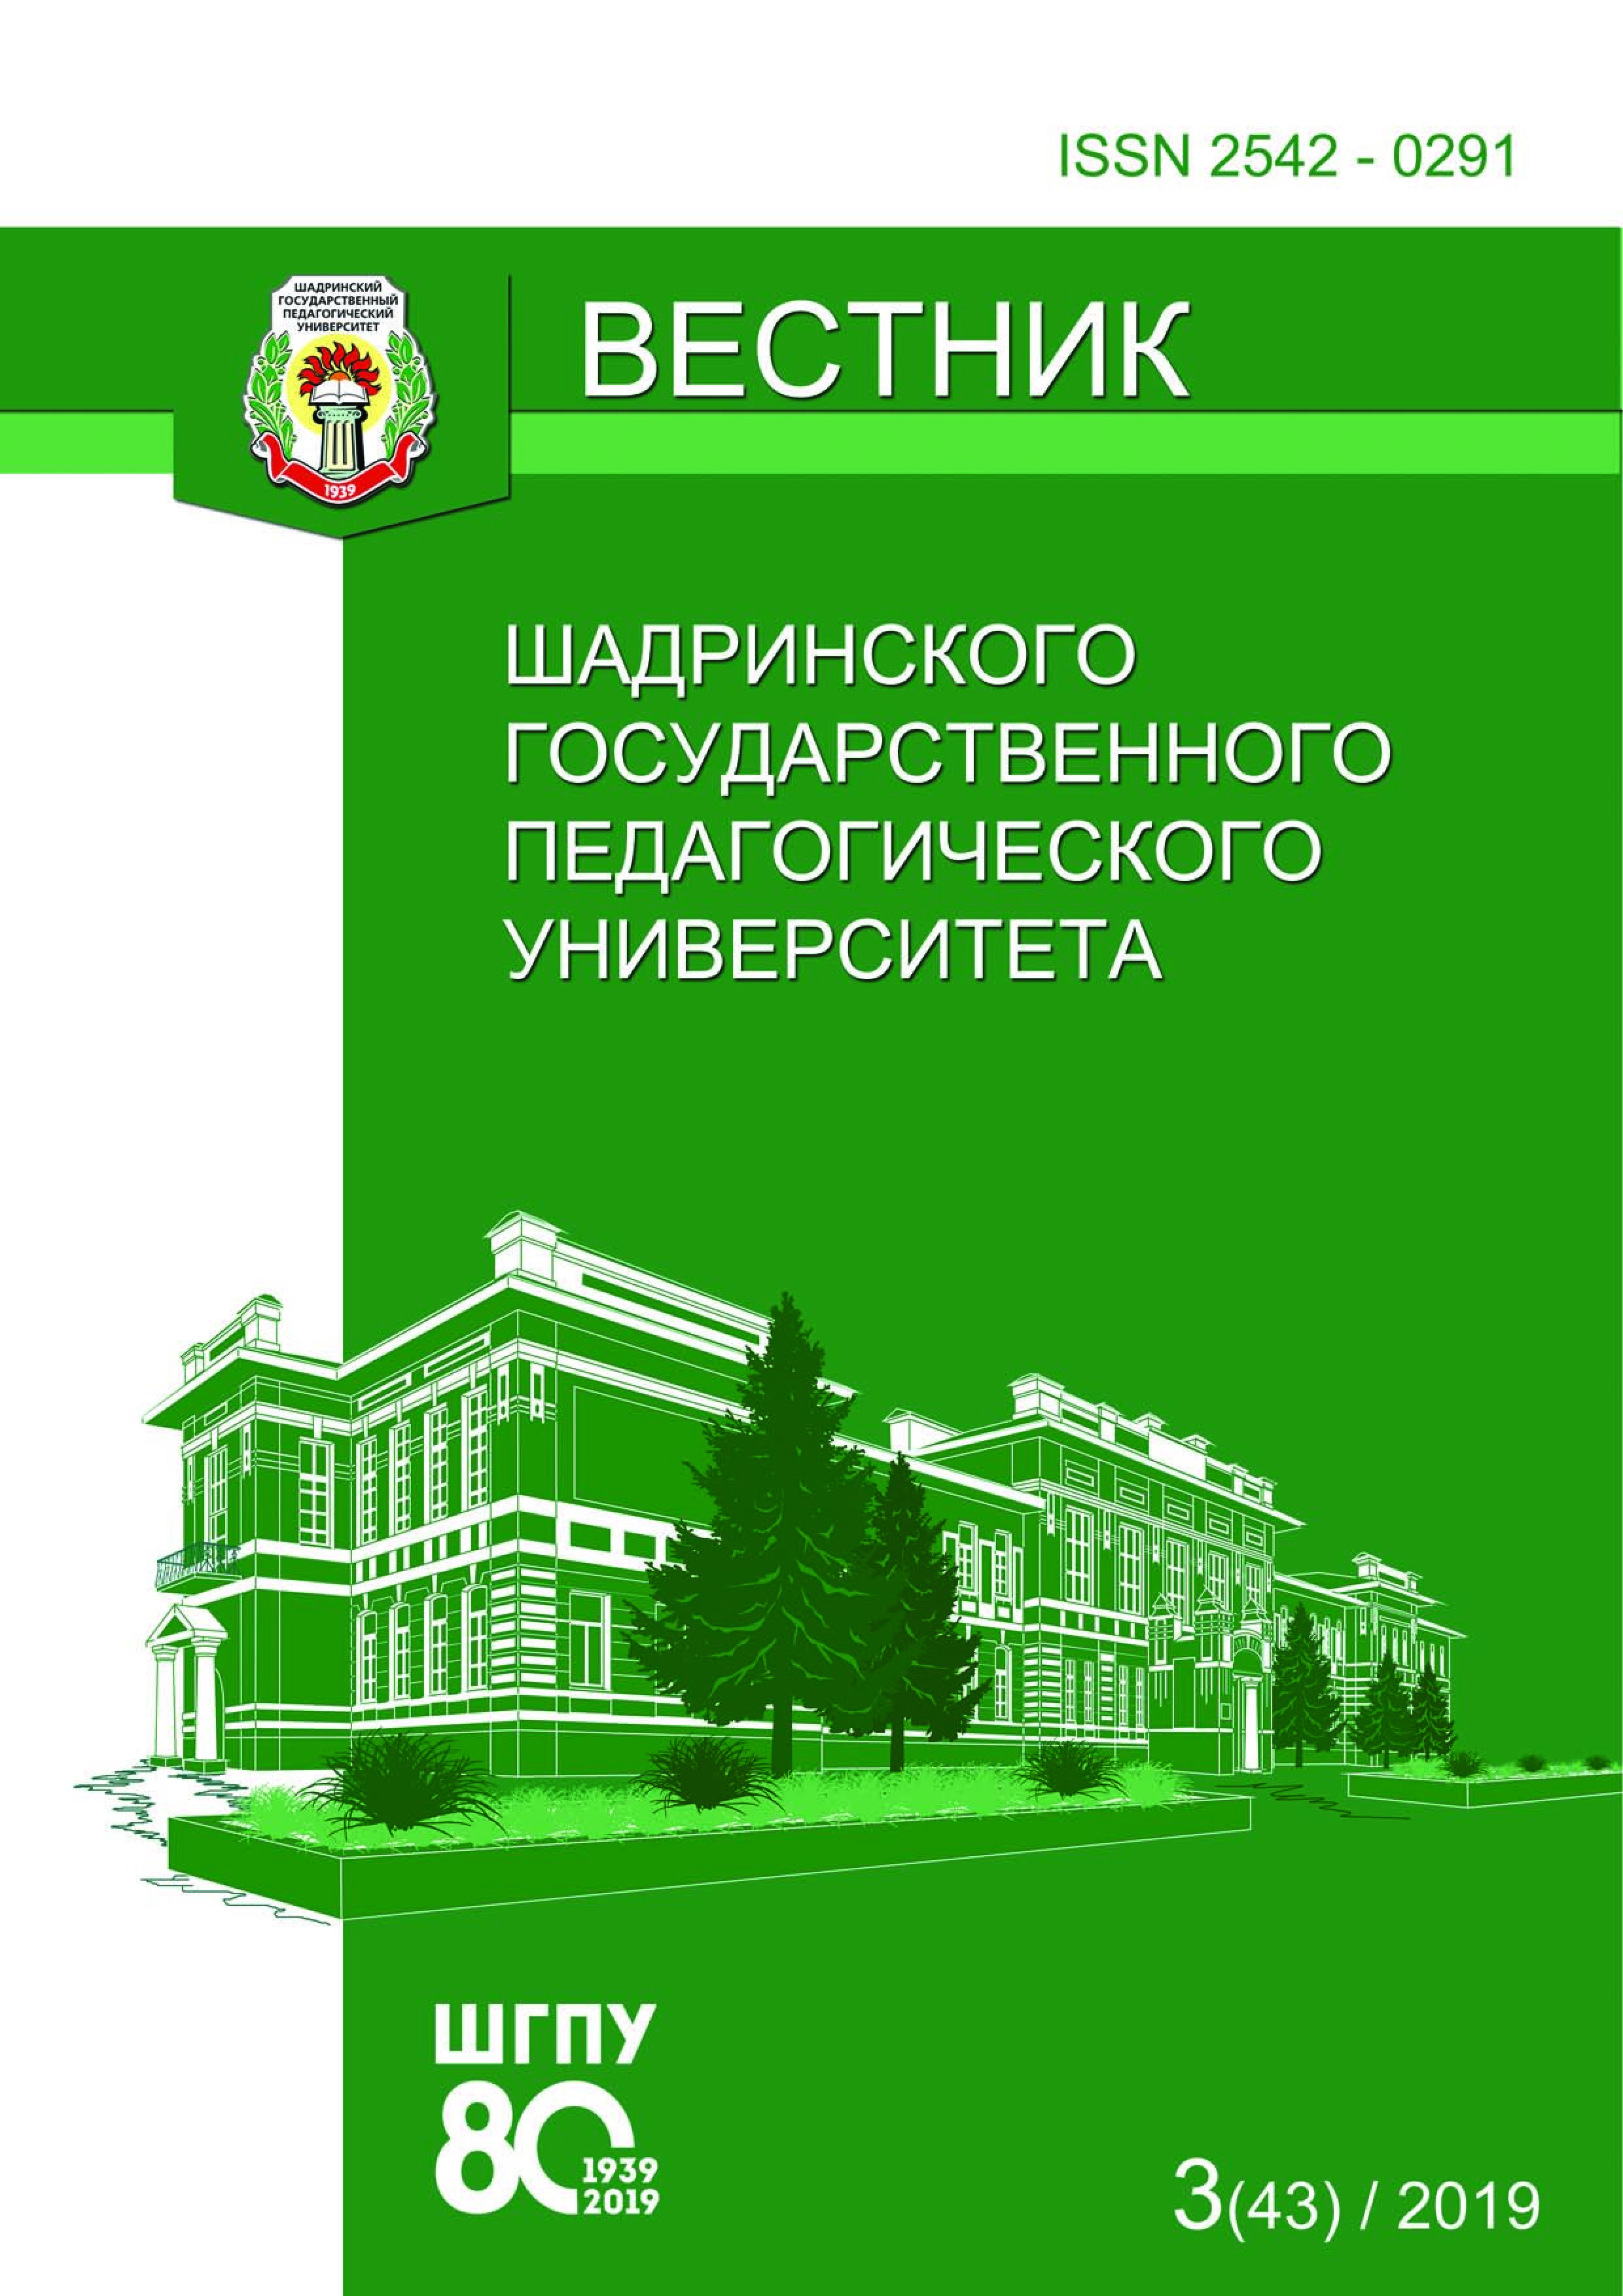 "обложка журнала ""Вестник ШГПУ"" 3(43) 2019"